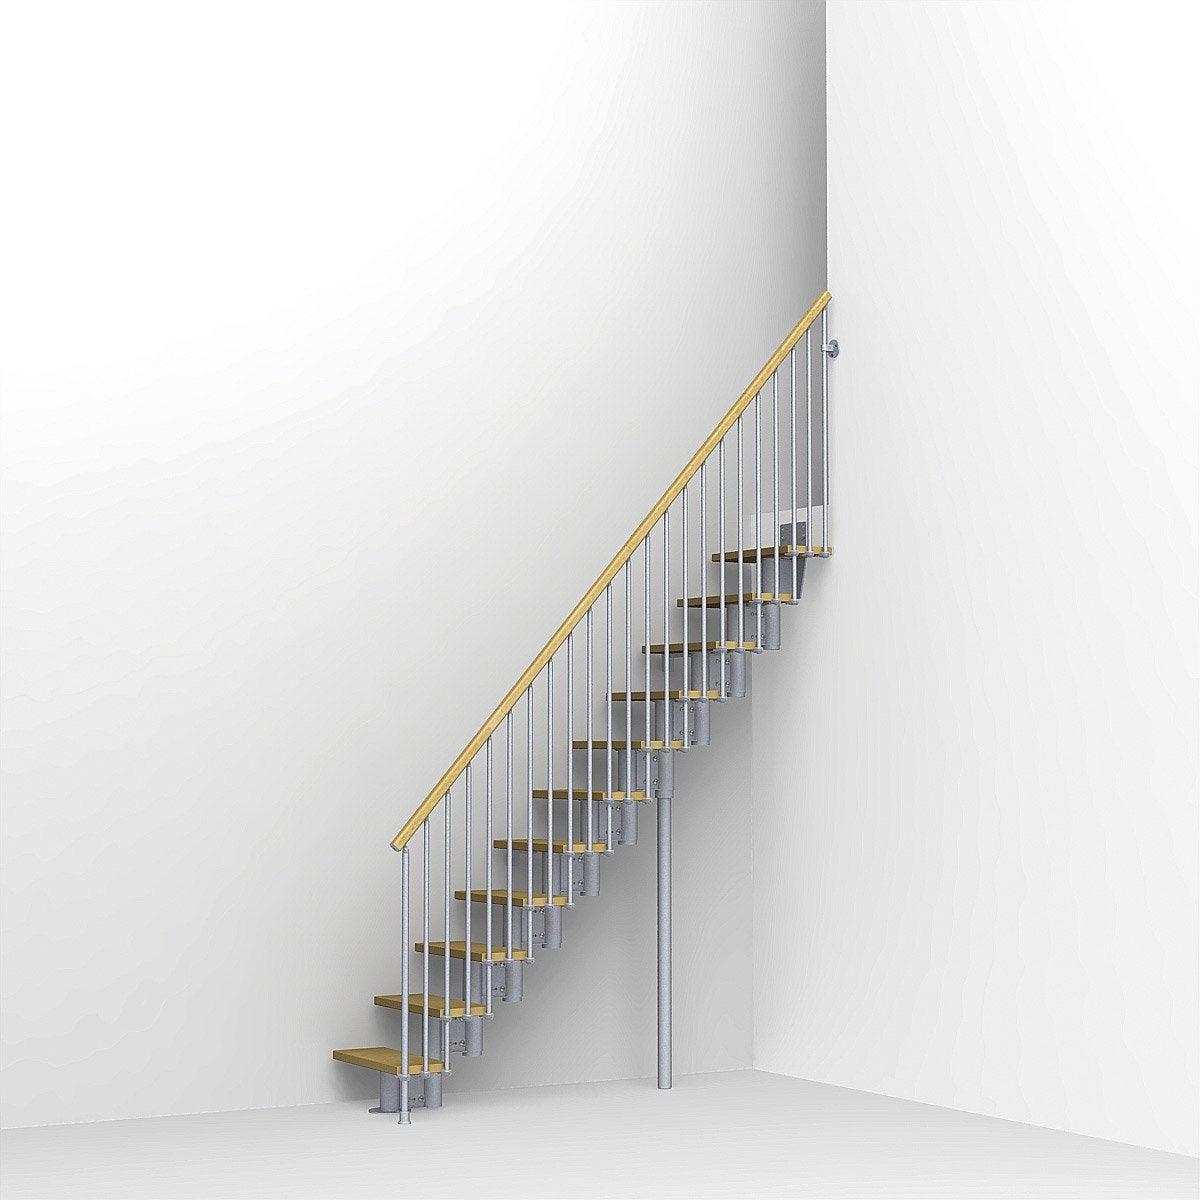 escalier modulaire strong marches bois structure m tal gris leroy merlin. Black Bedroom Furniture Sets. Home Design Ideas